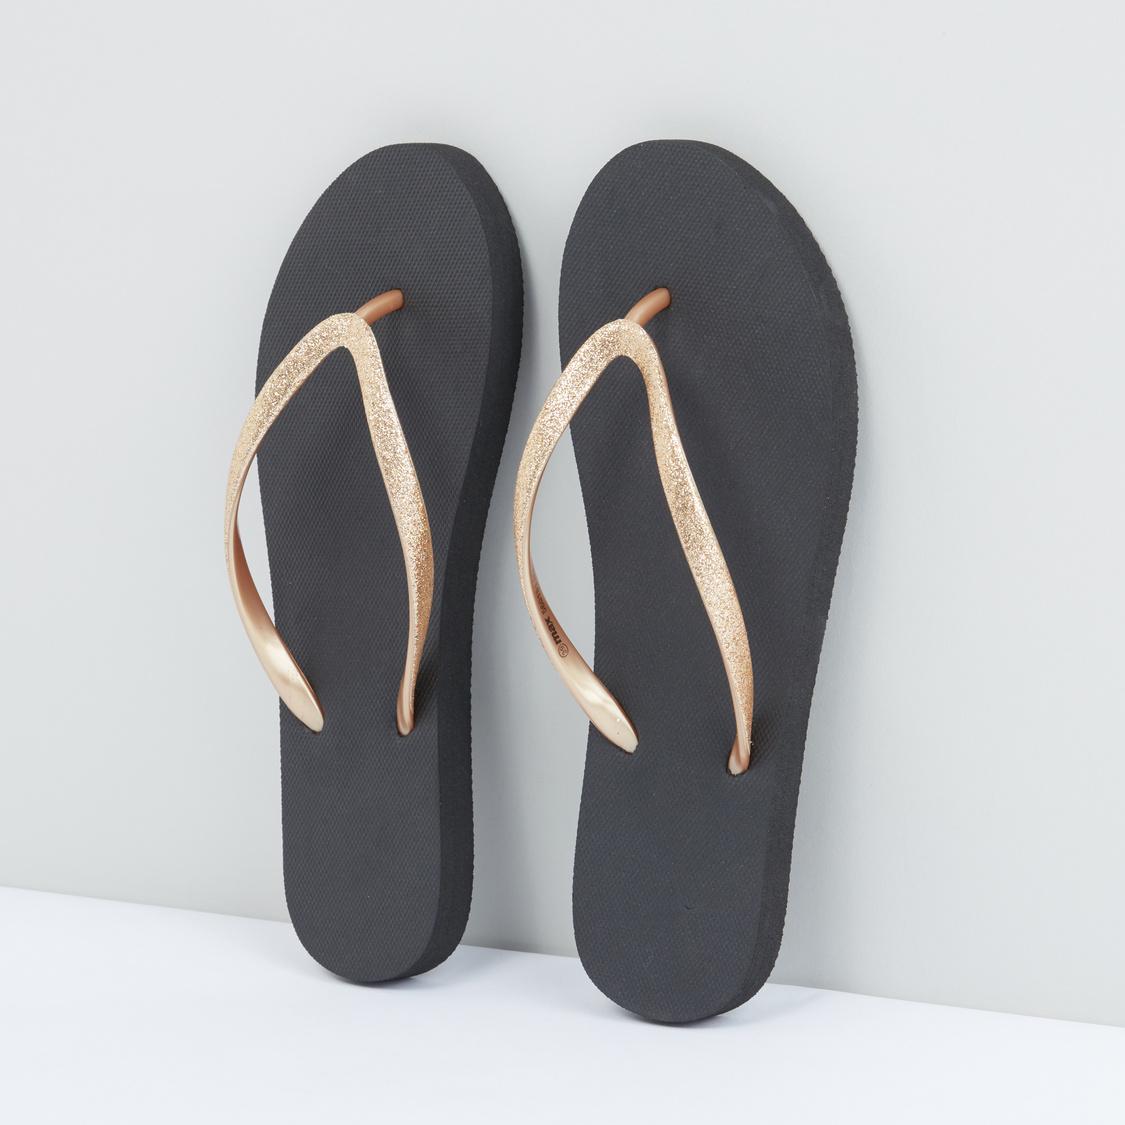 Flip Flops with Metallic Straps